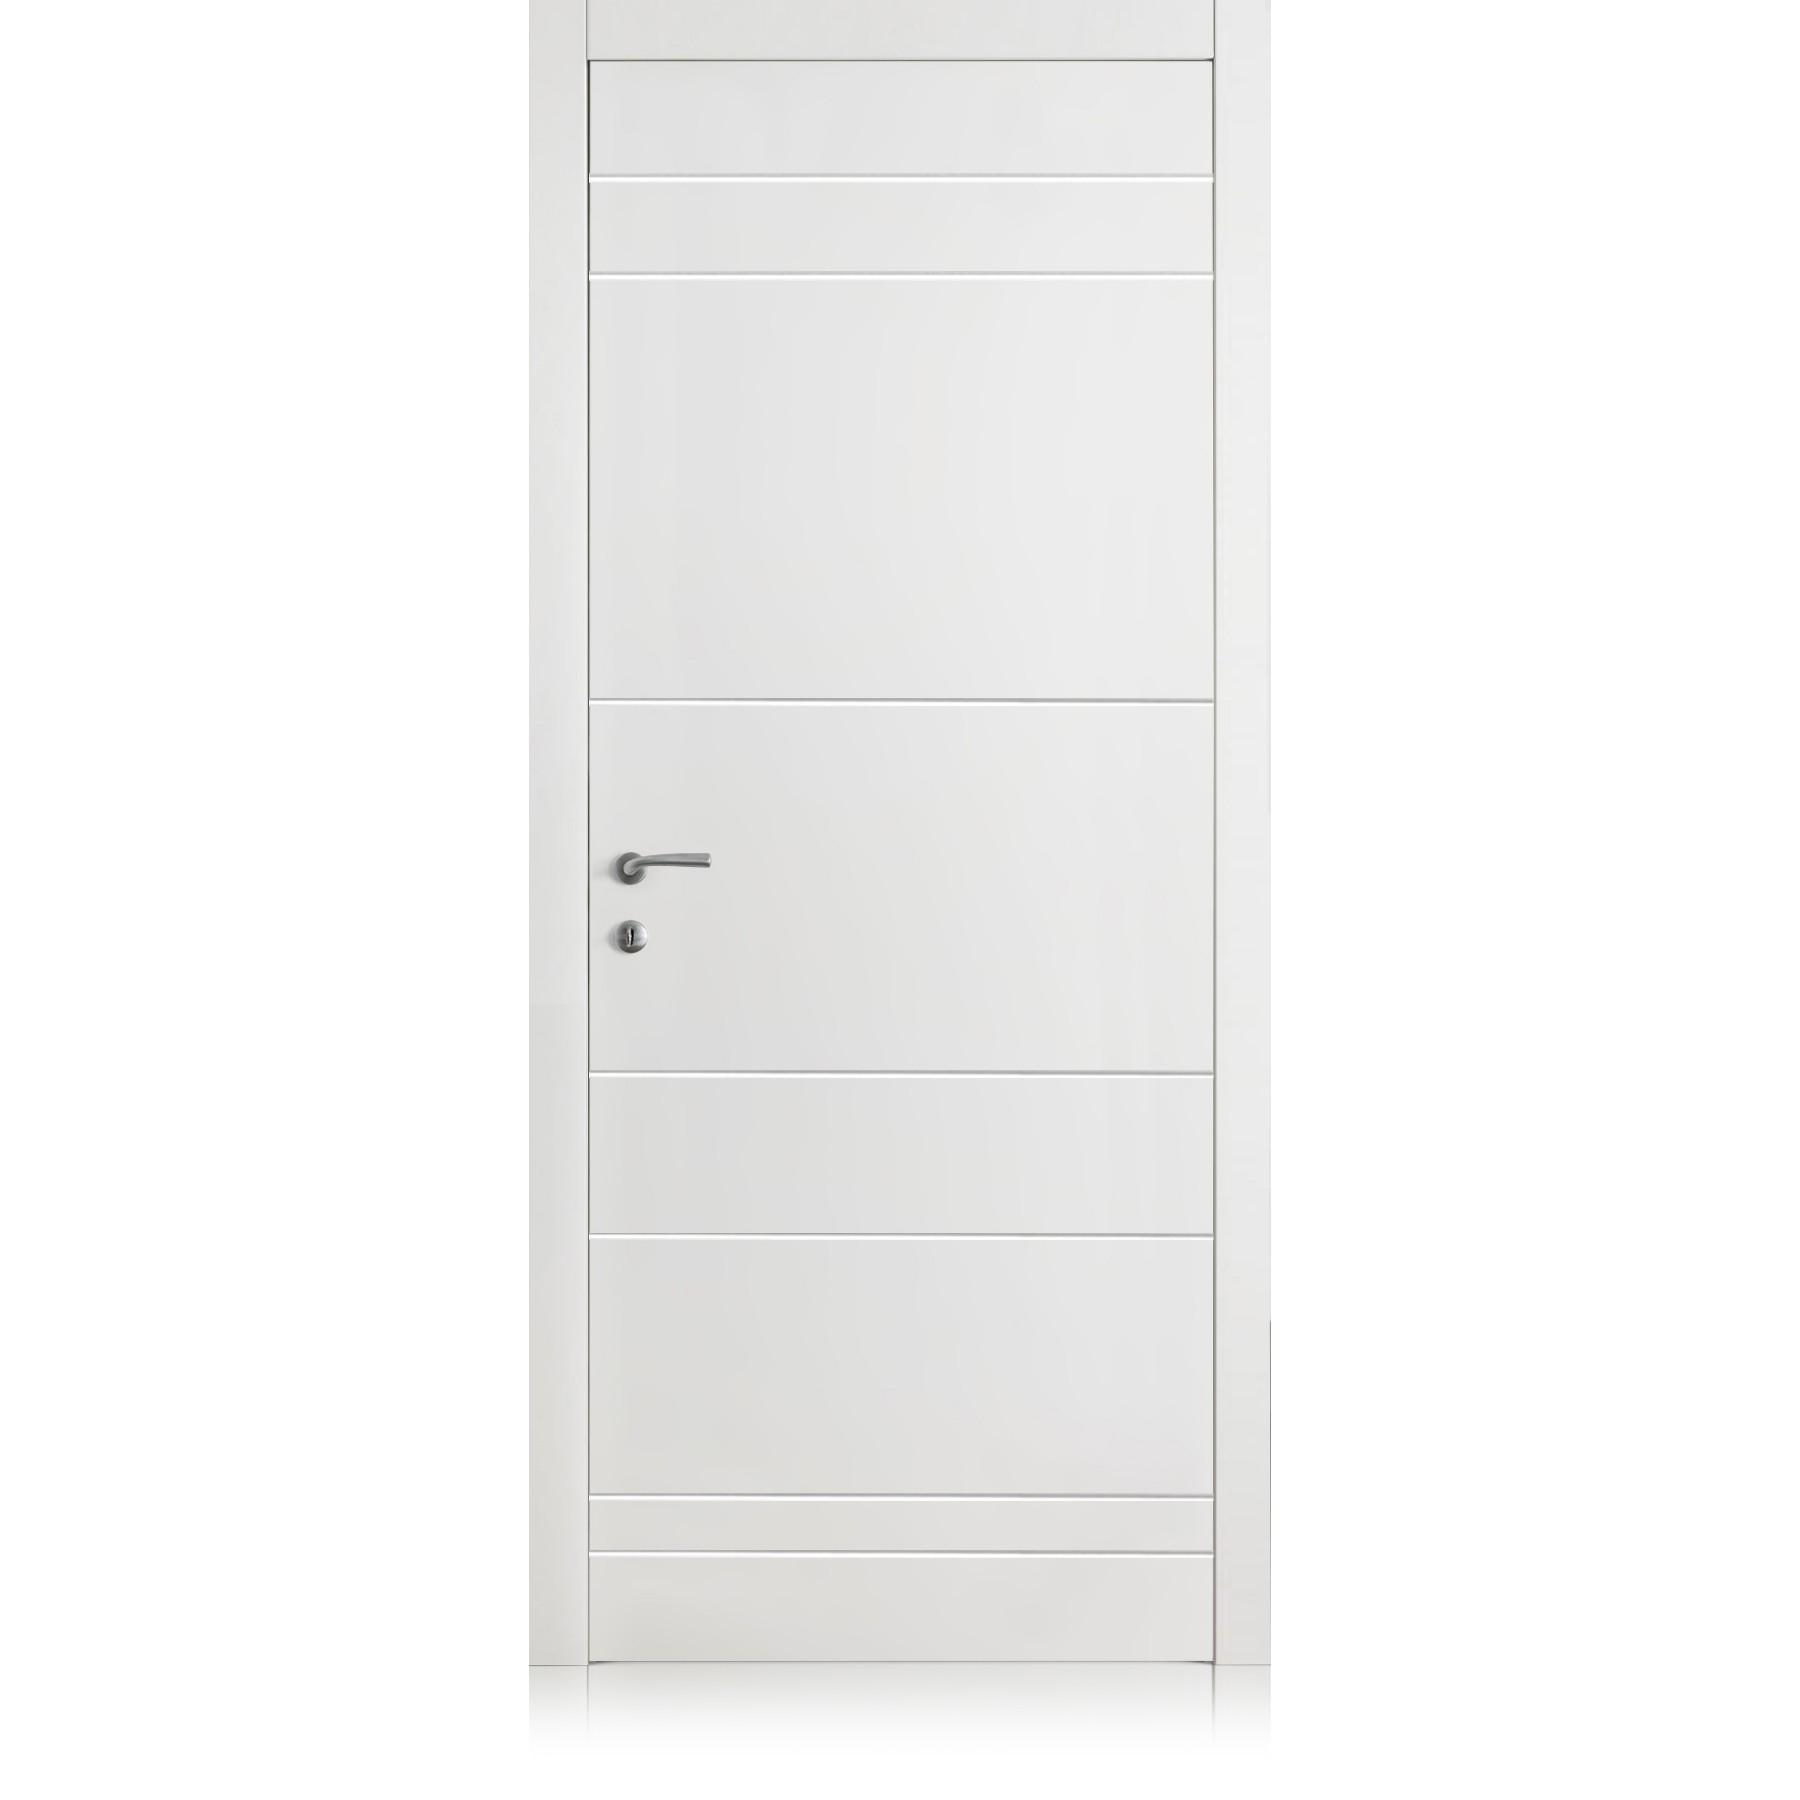 Yncisa Tratto bianco door